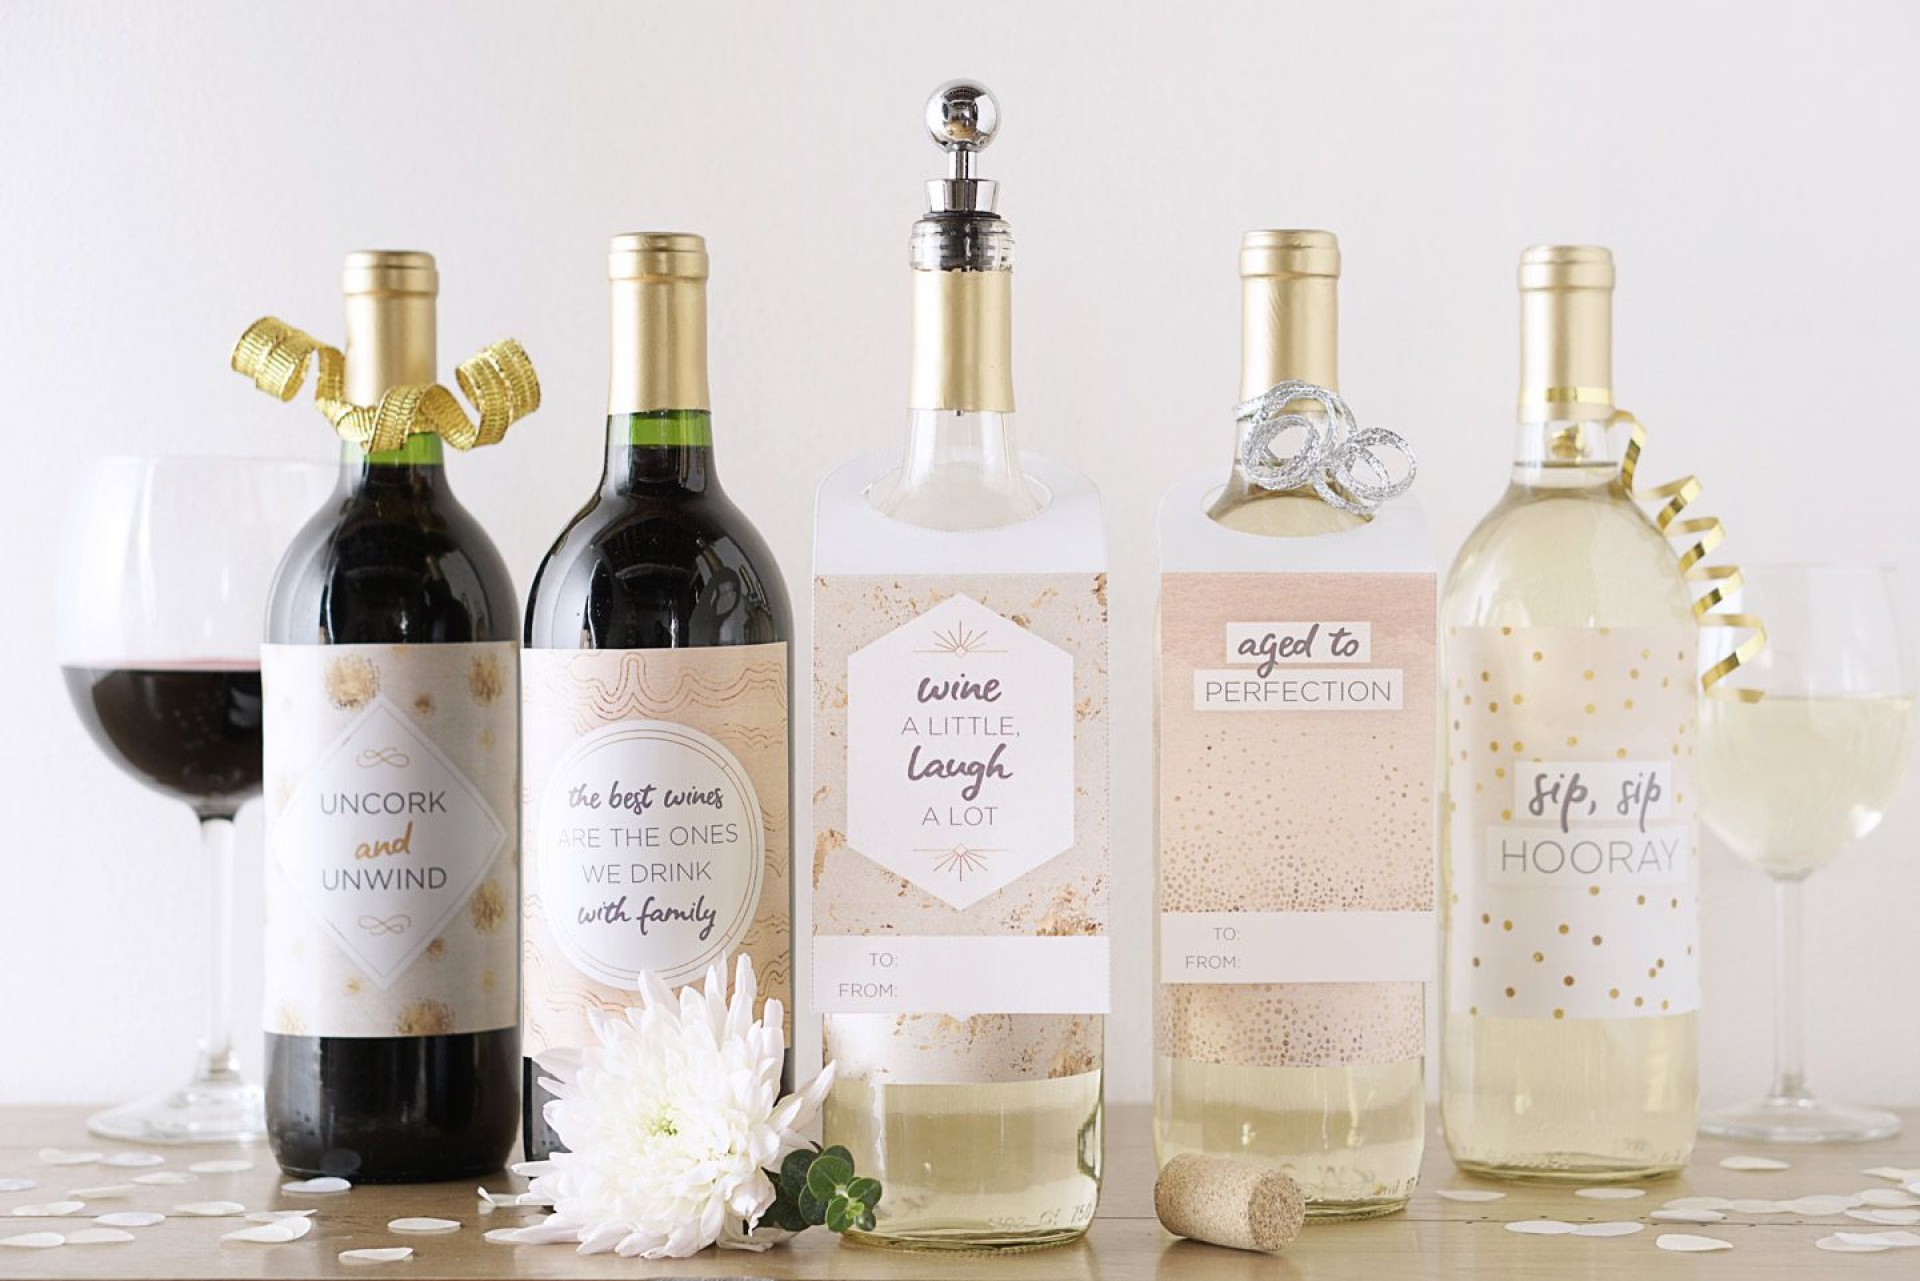 008 Incredible Free Wine Bottle Label Template Image  Mini Printable1920